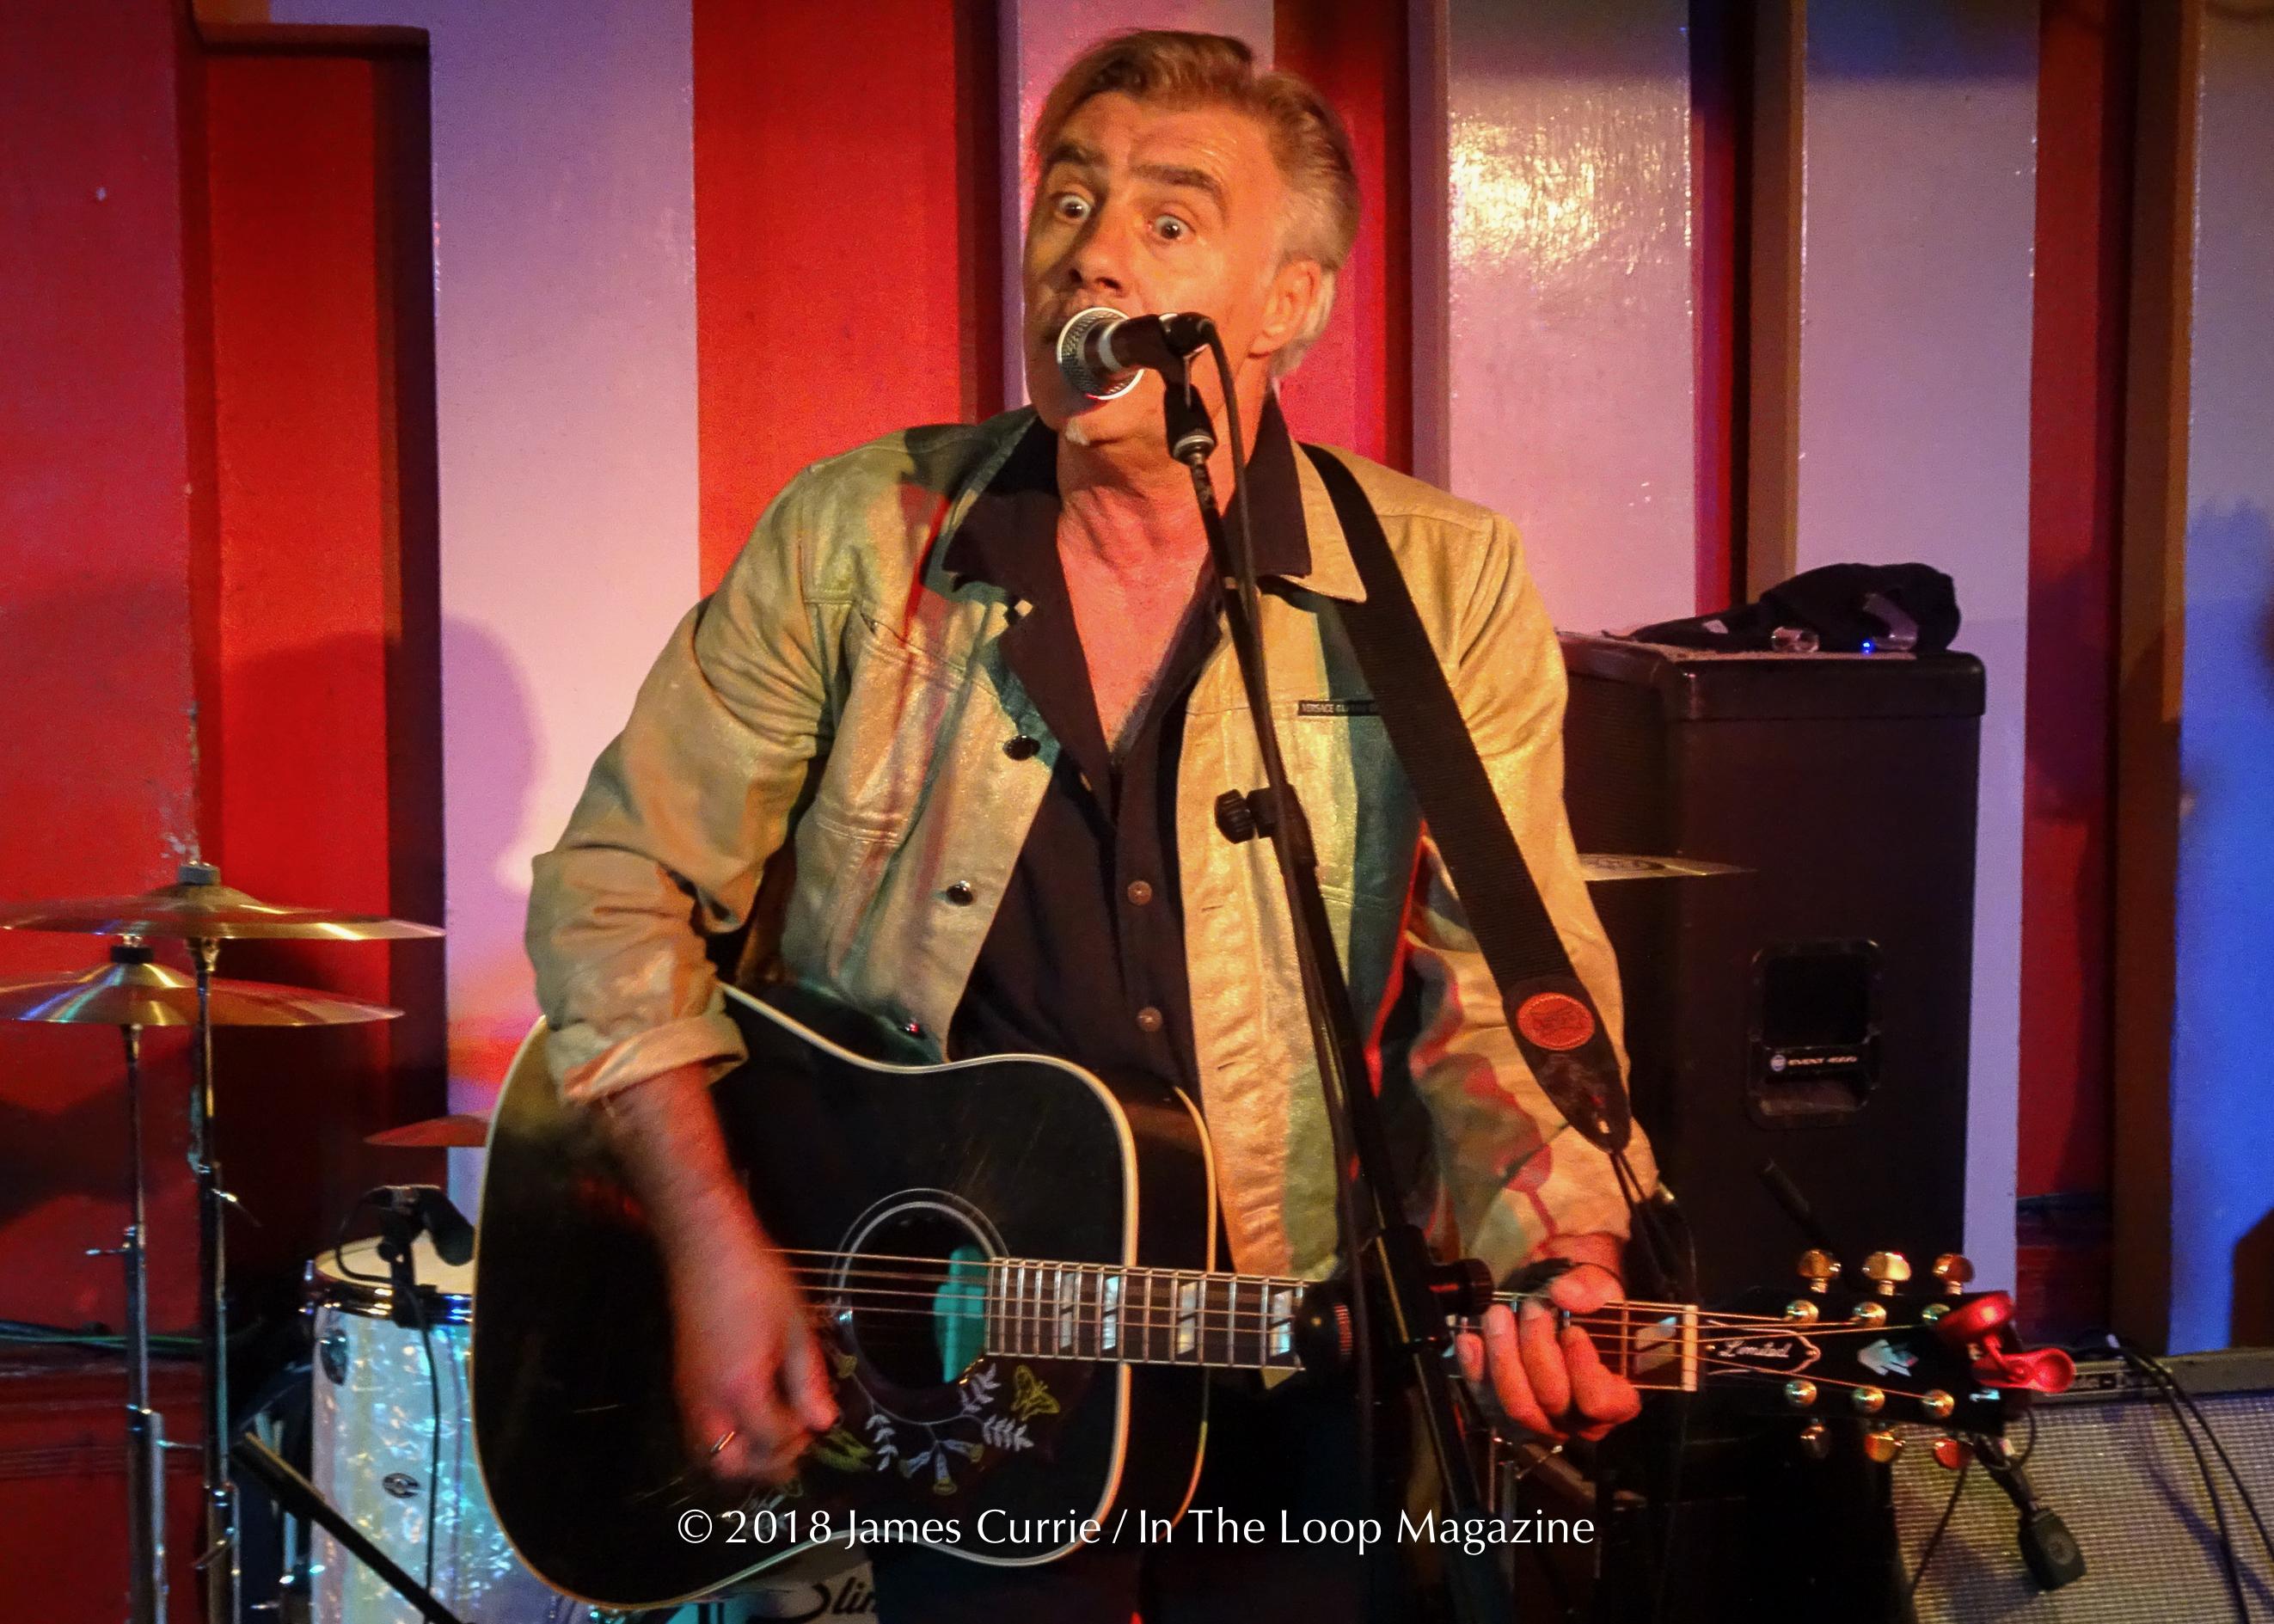 ITLM OTRS: Glen Matlock (Sex Pistols) @ Club 100 (London, UK)